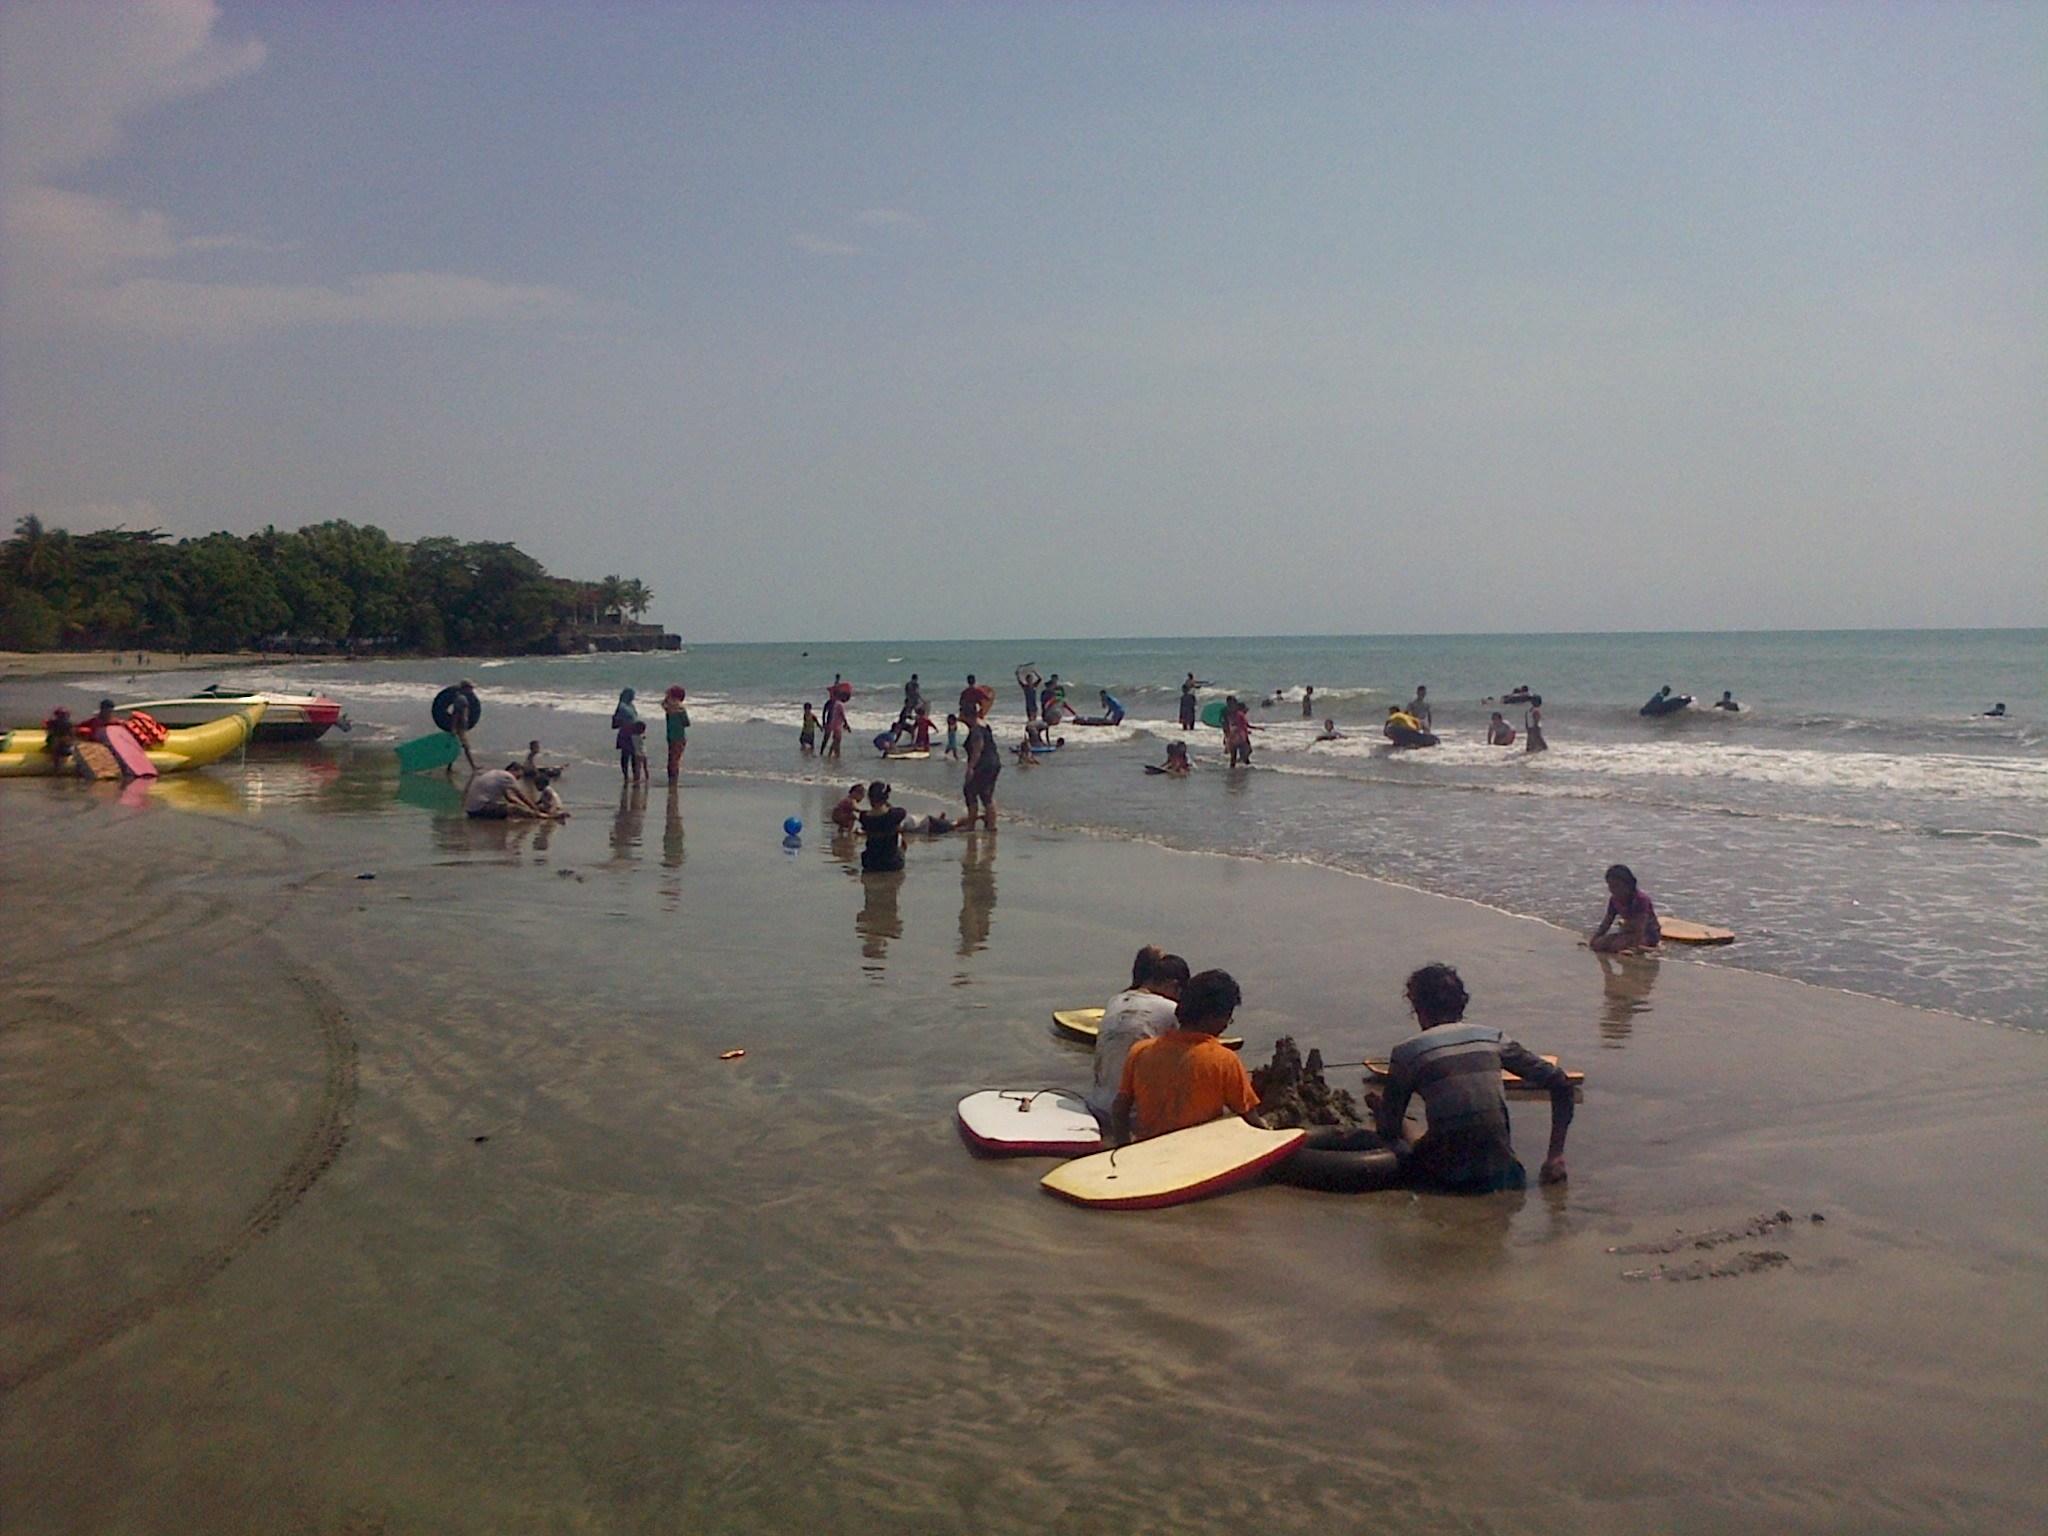 Wisatawan Pantai Meningkat Pengelola Sebut Sepi Ya Pengunjung Sambolo 2